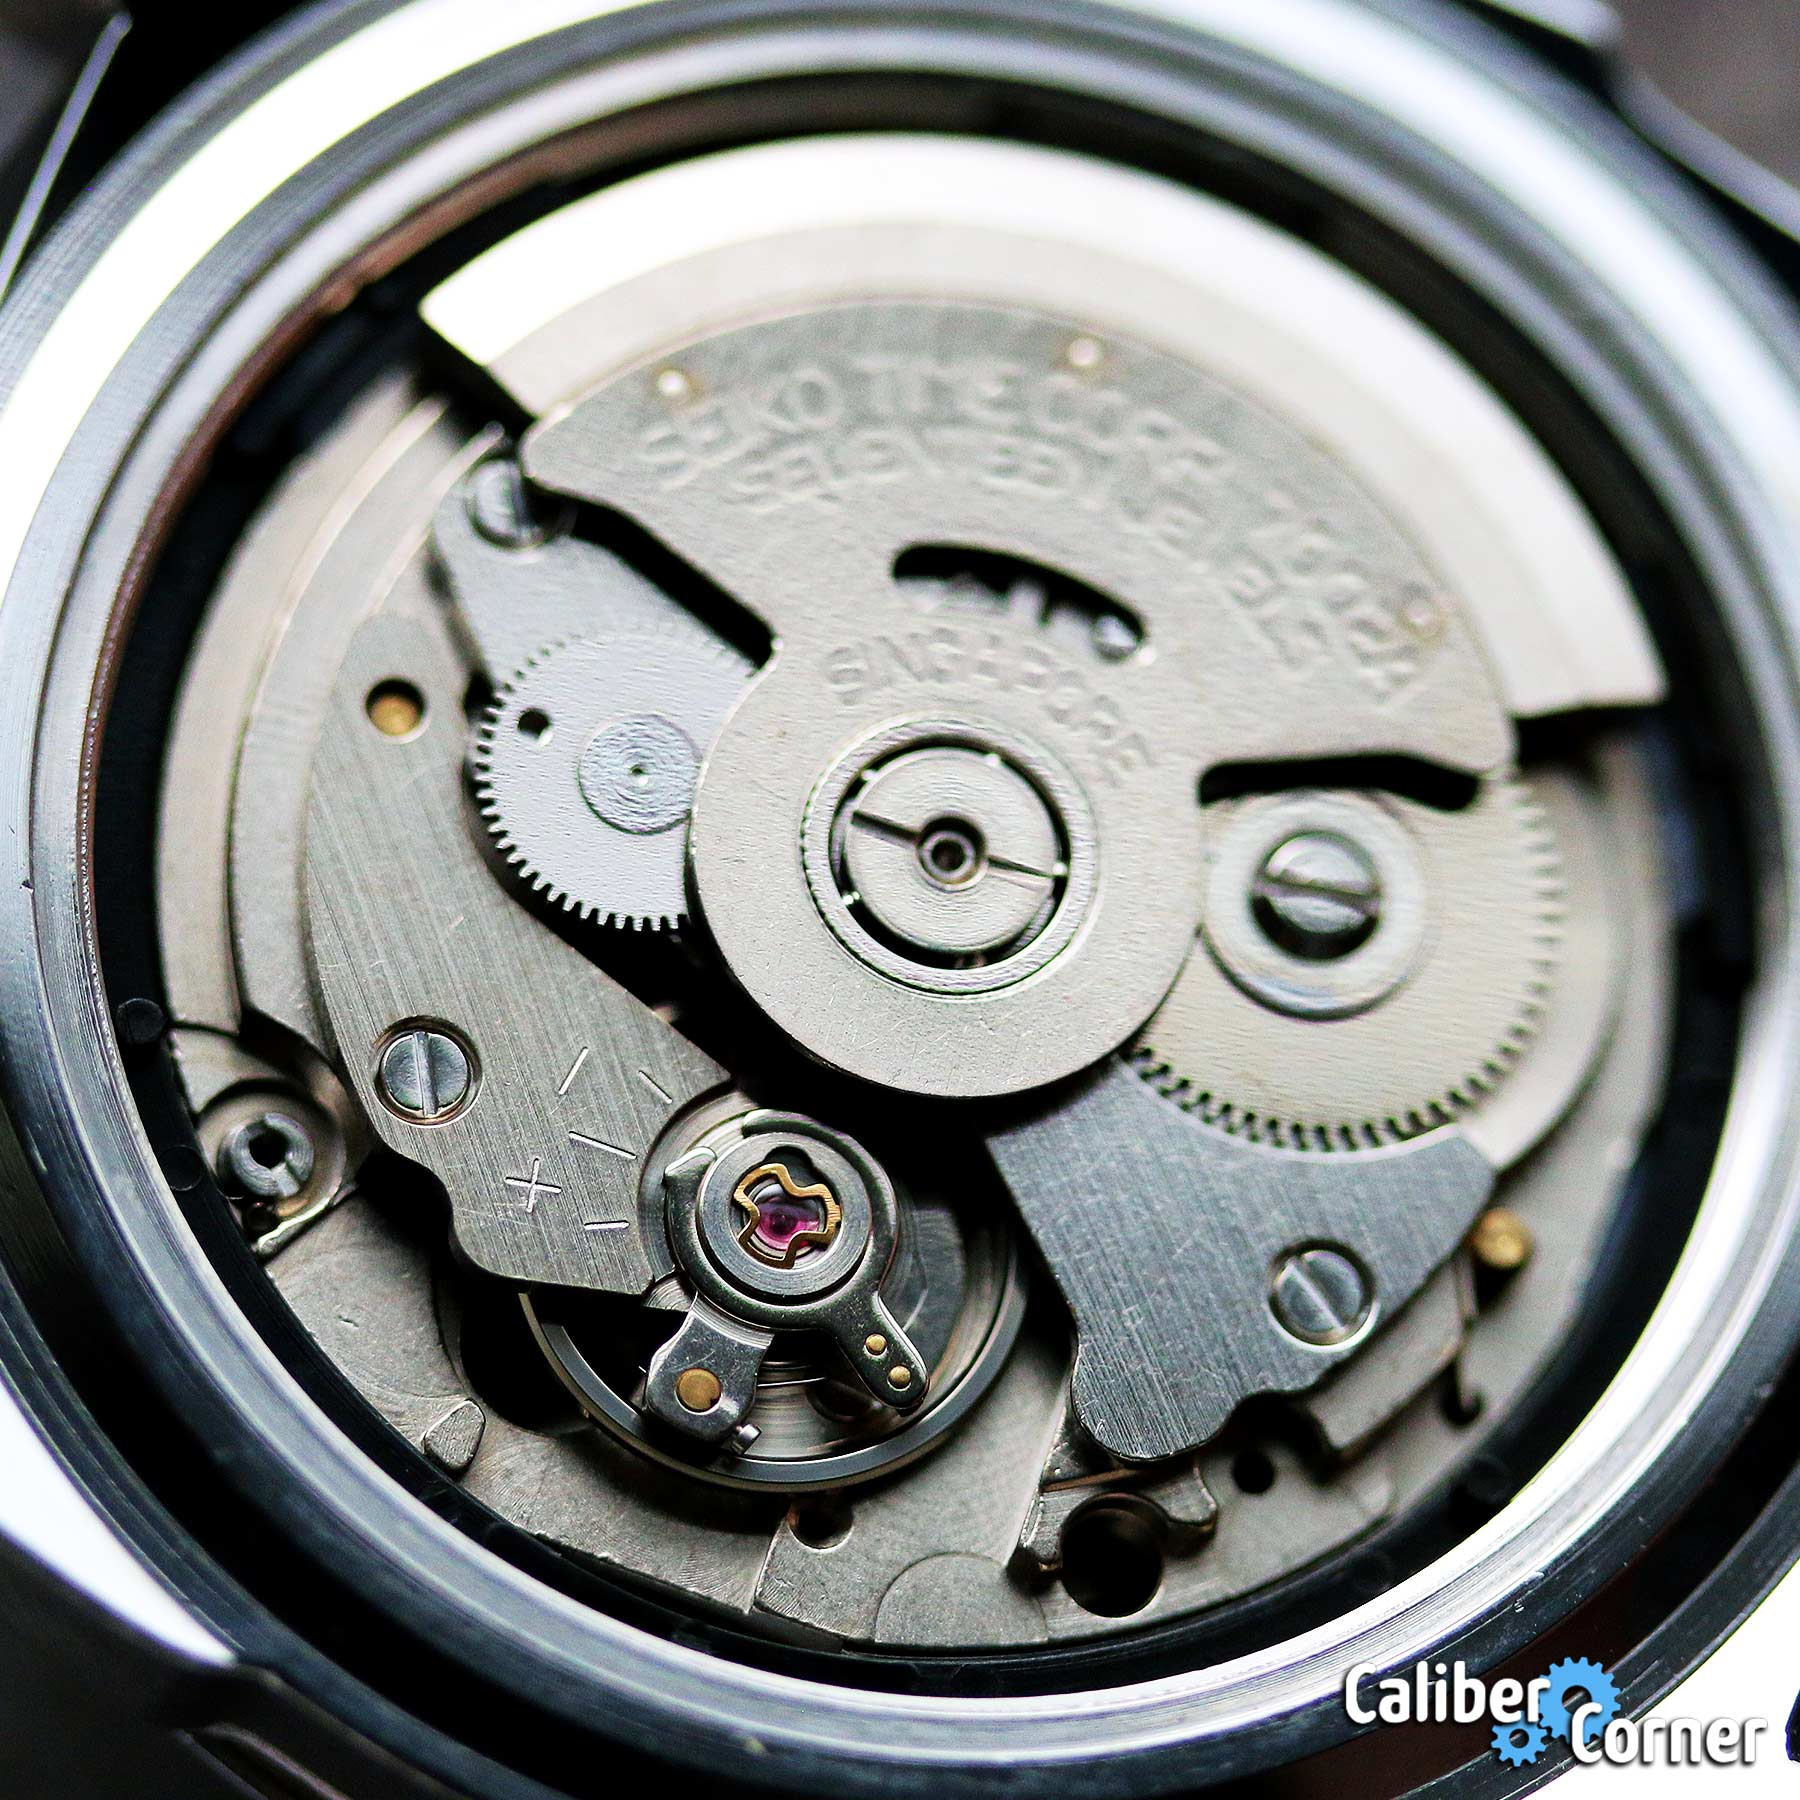 Seiko Caliber 7002a Balance Wheel